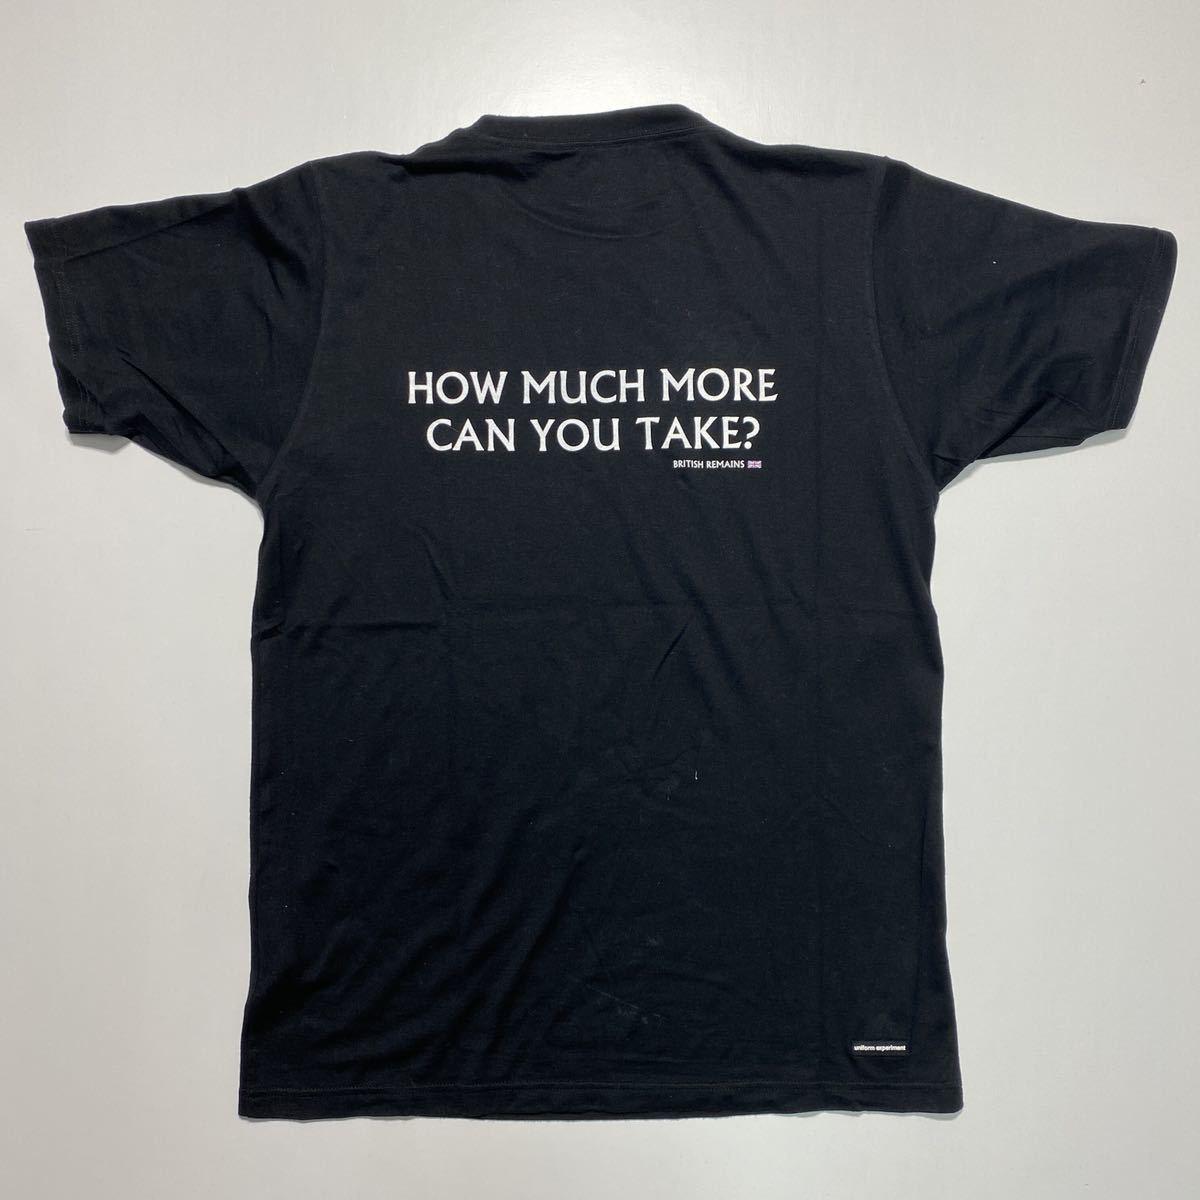 【3】uniform experiment Fragment design Tee ユニフォーム エクスペリメント フラグメントデザイン Tシャツ ブラック G485_画像2